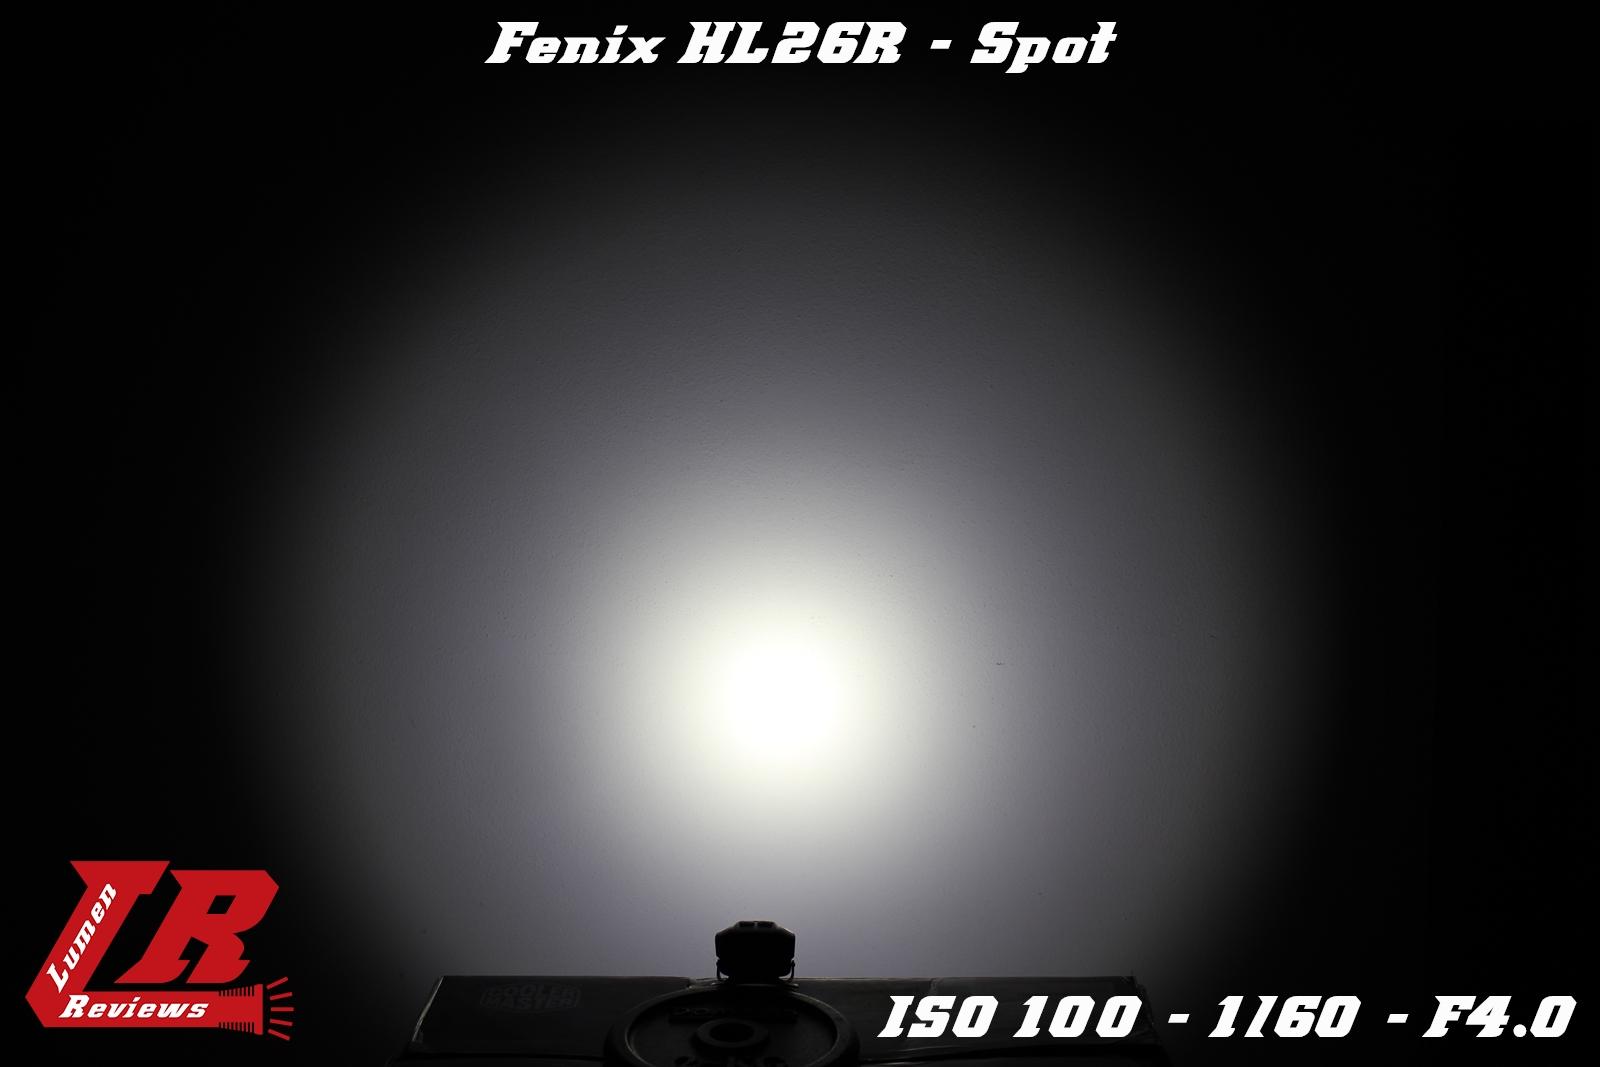 Fenix HL26R 18